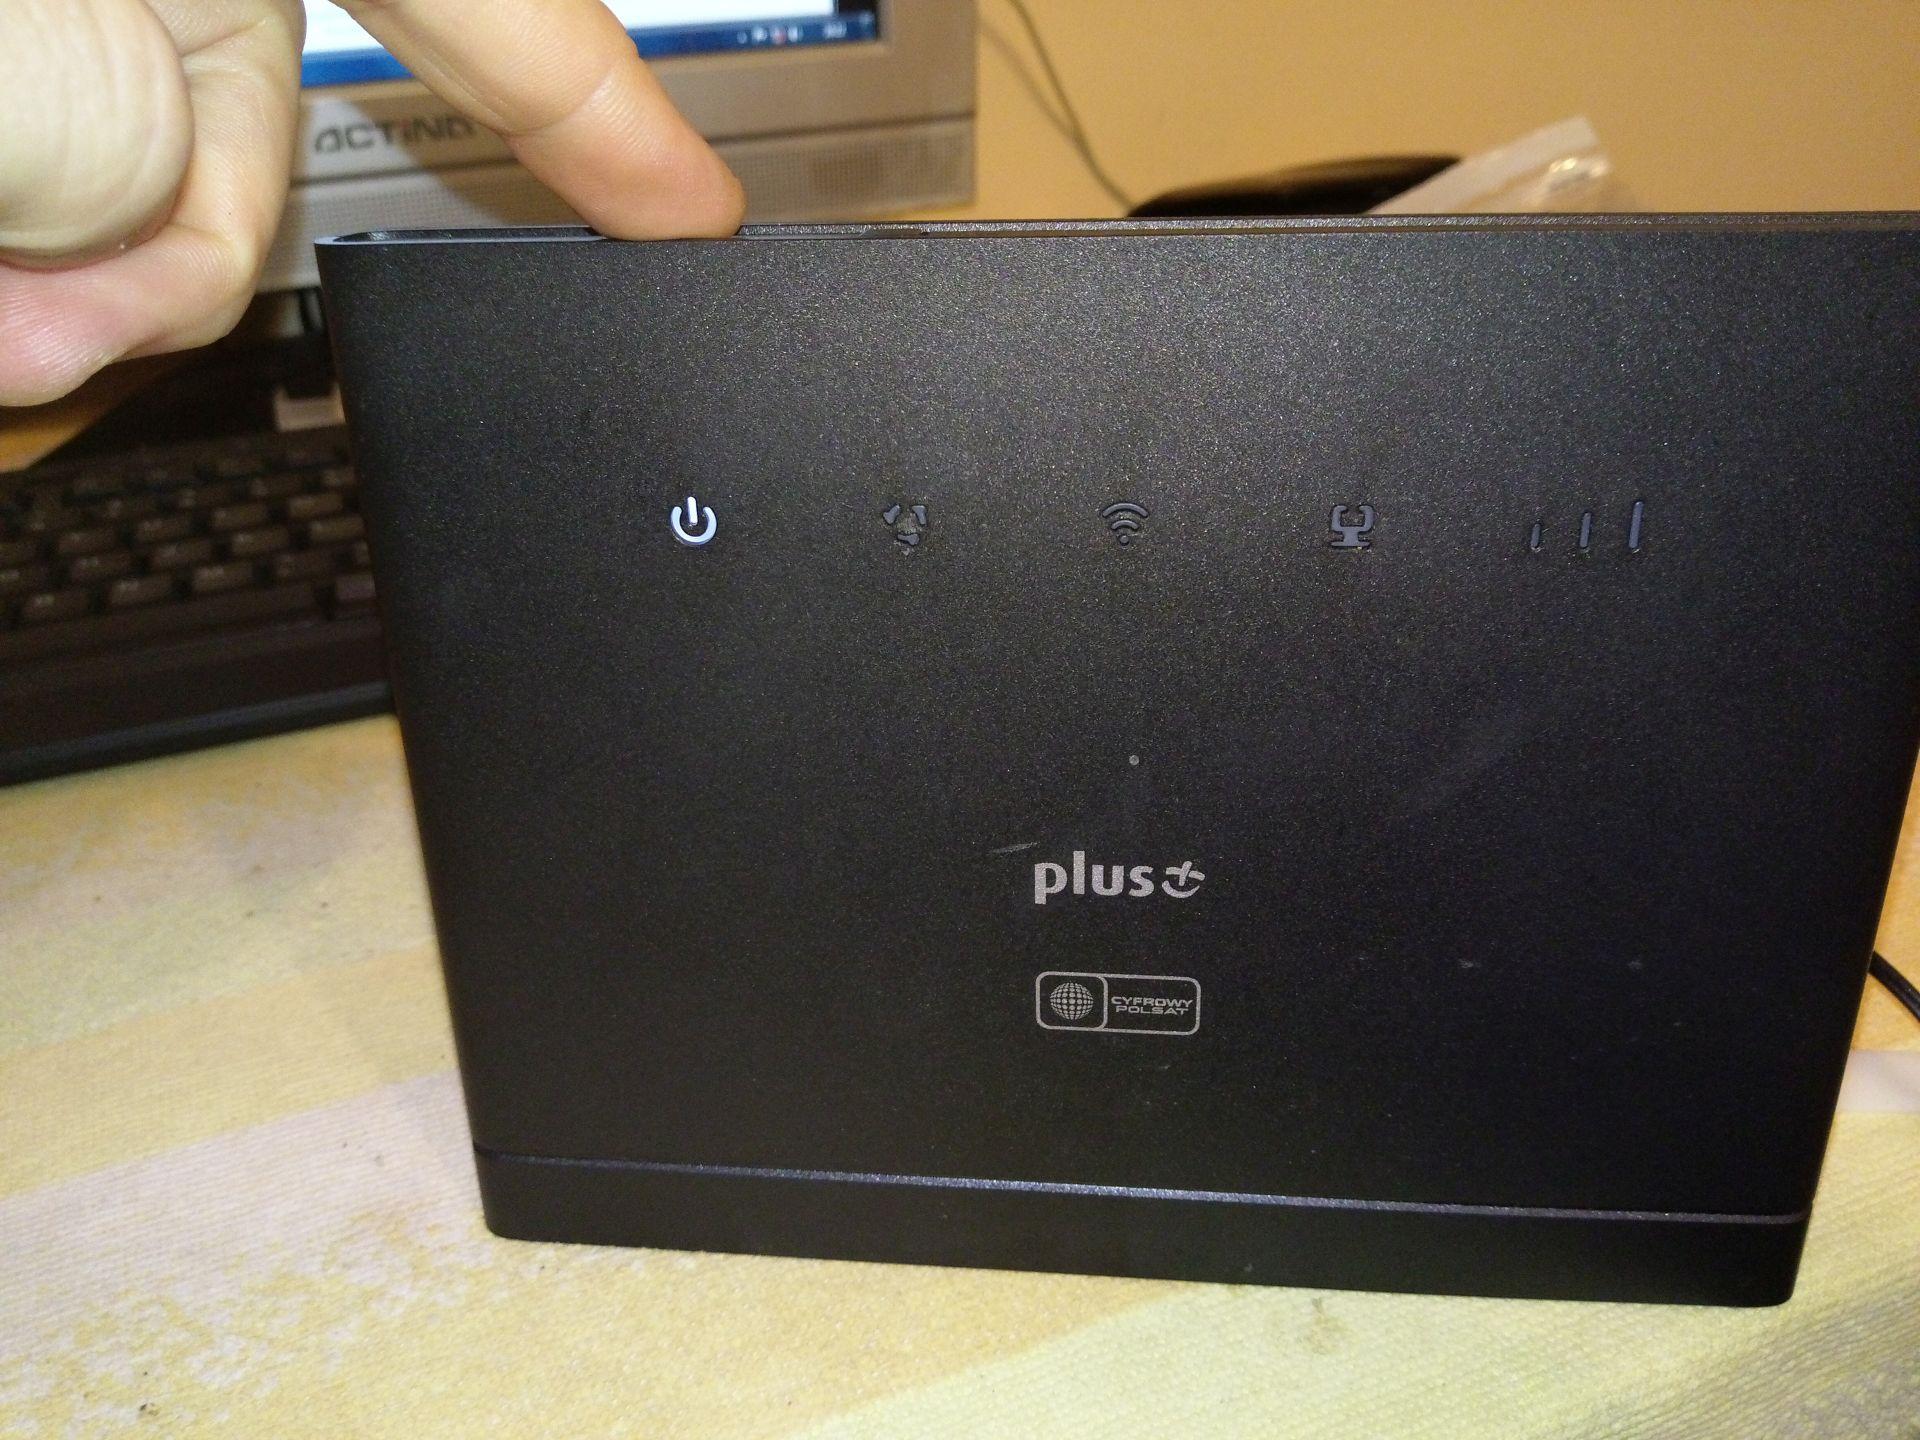 Solved] Huawei B315s-22 lights up only Power LED - elektroda com